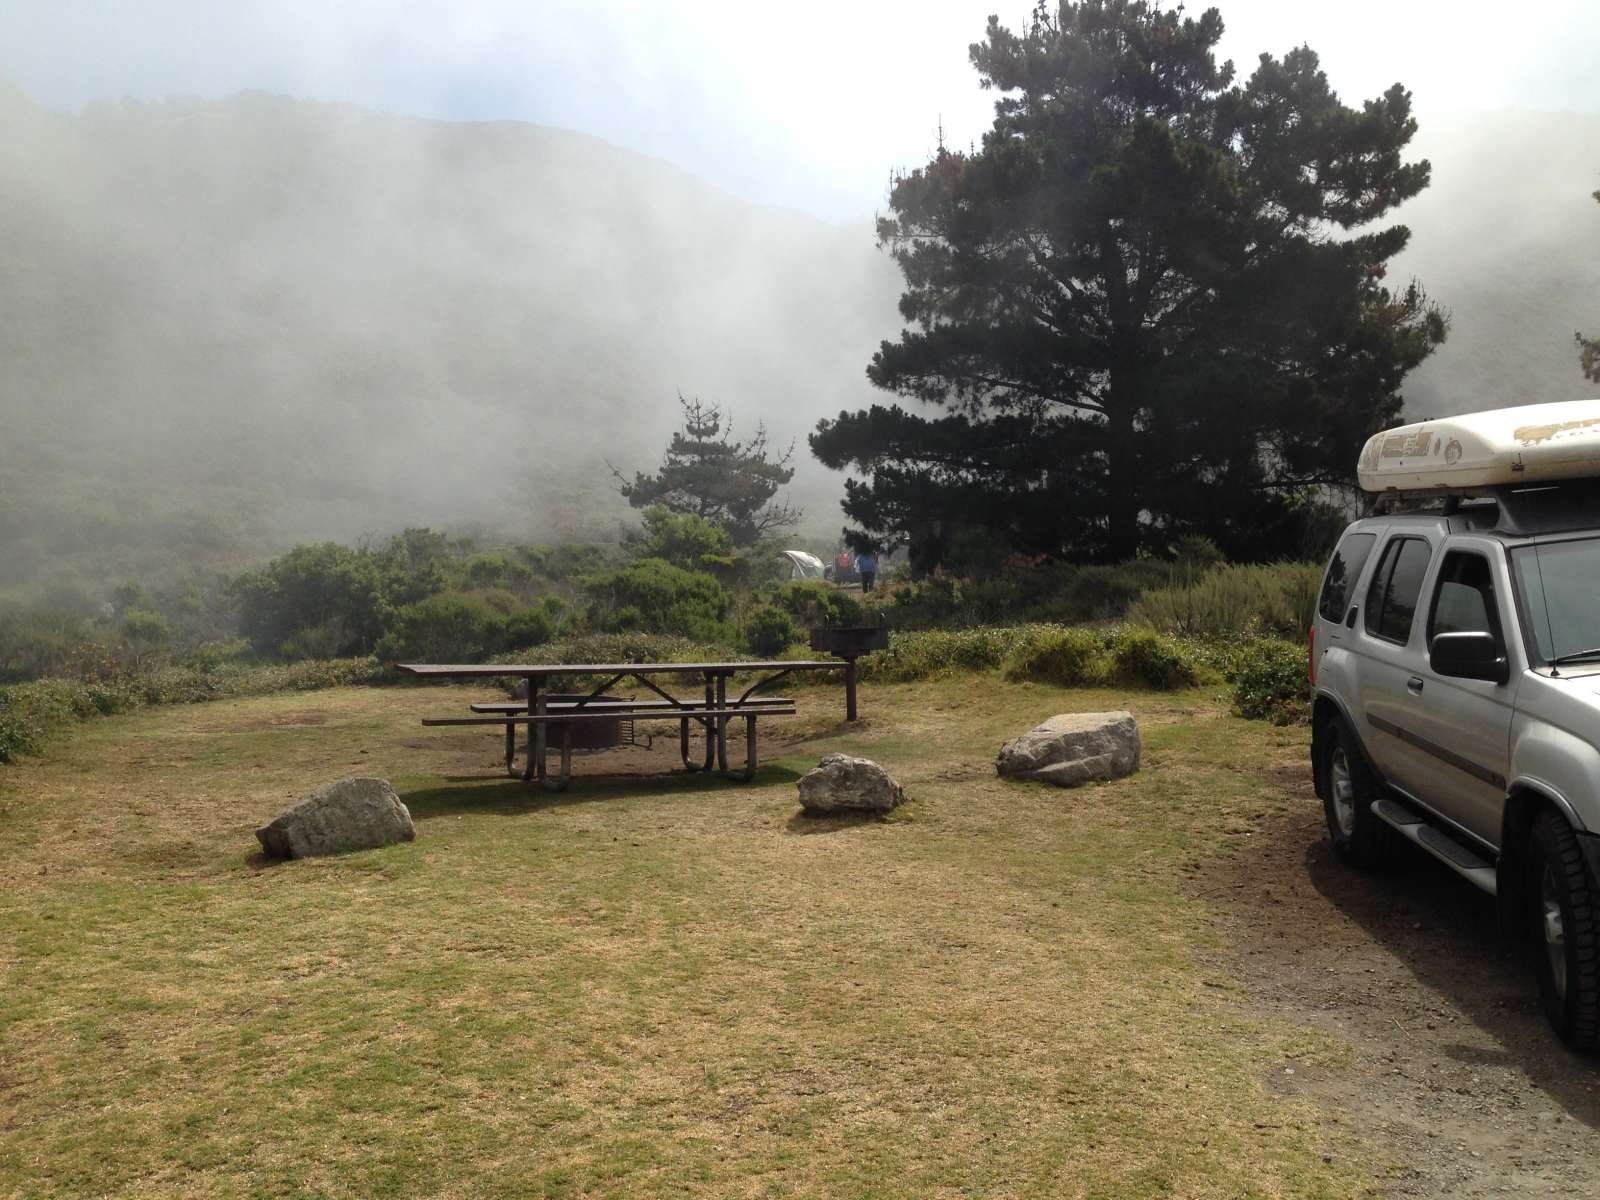 kirk creek campground, los padres, ca: 34 hipcamper reviews and 135